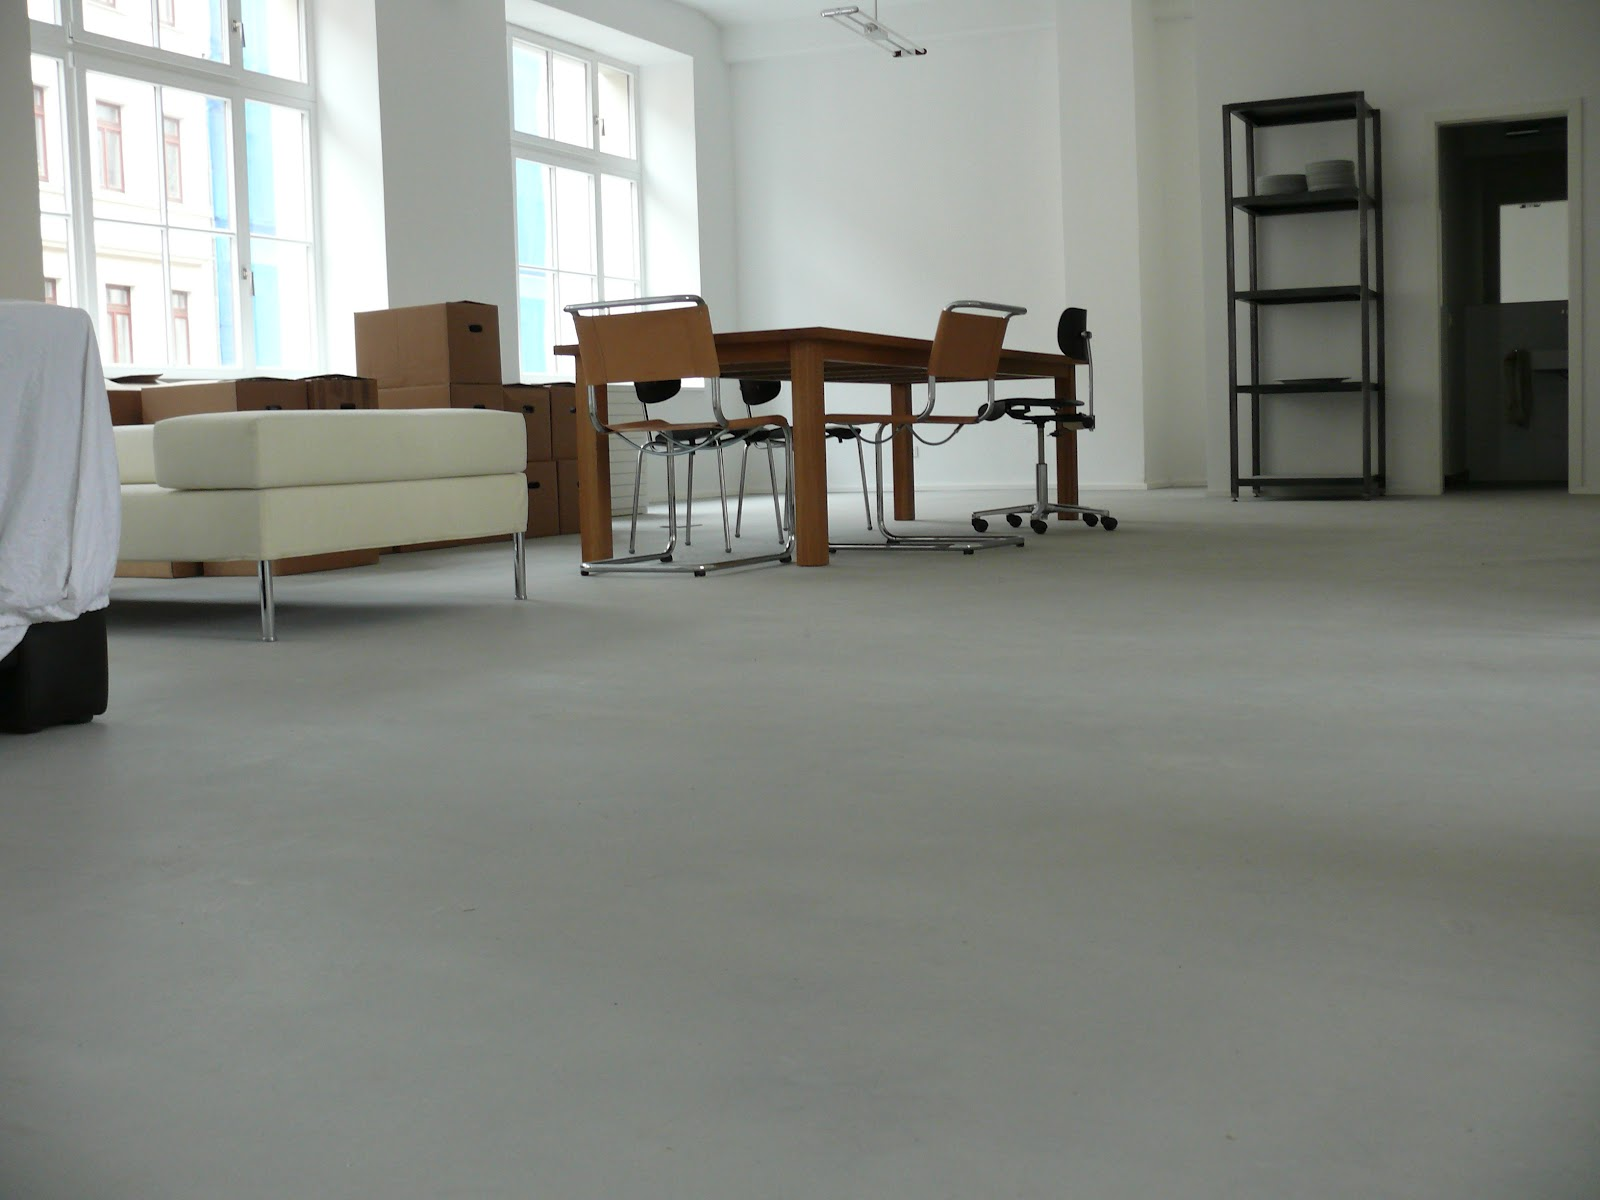 betoncire natur leosteen fabriketage in leipzig. Black Bedroom Furniture Sets. Home Design Ideas